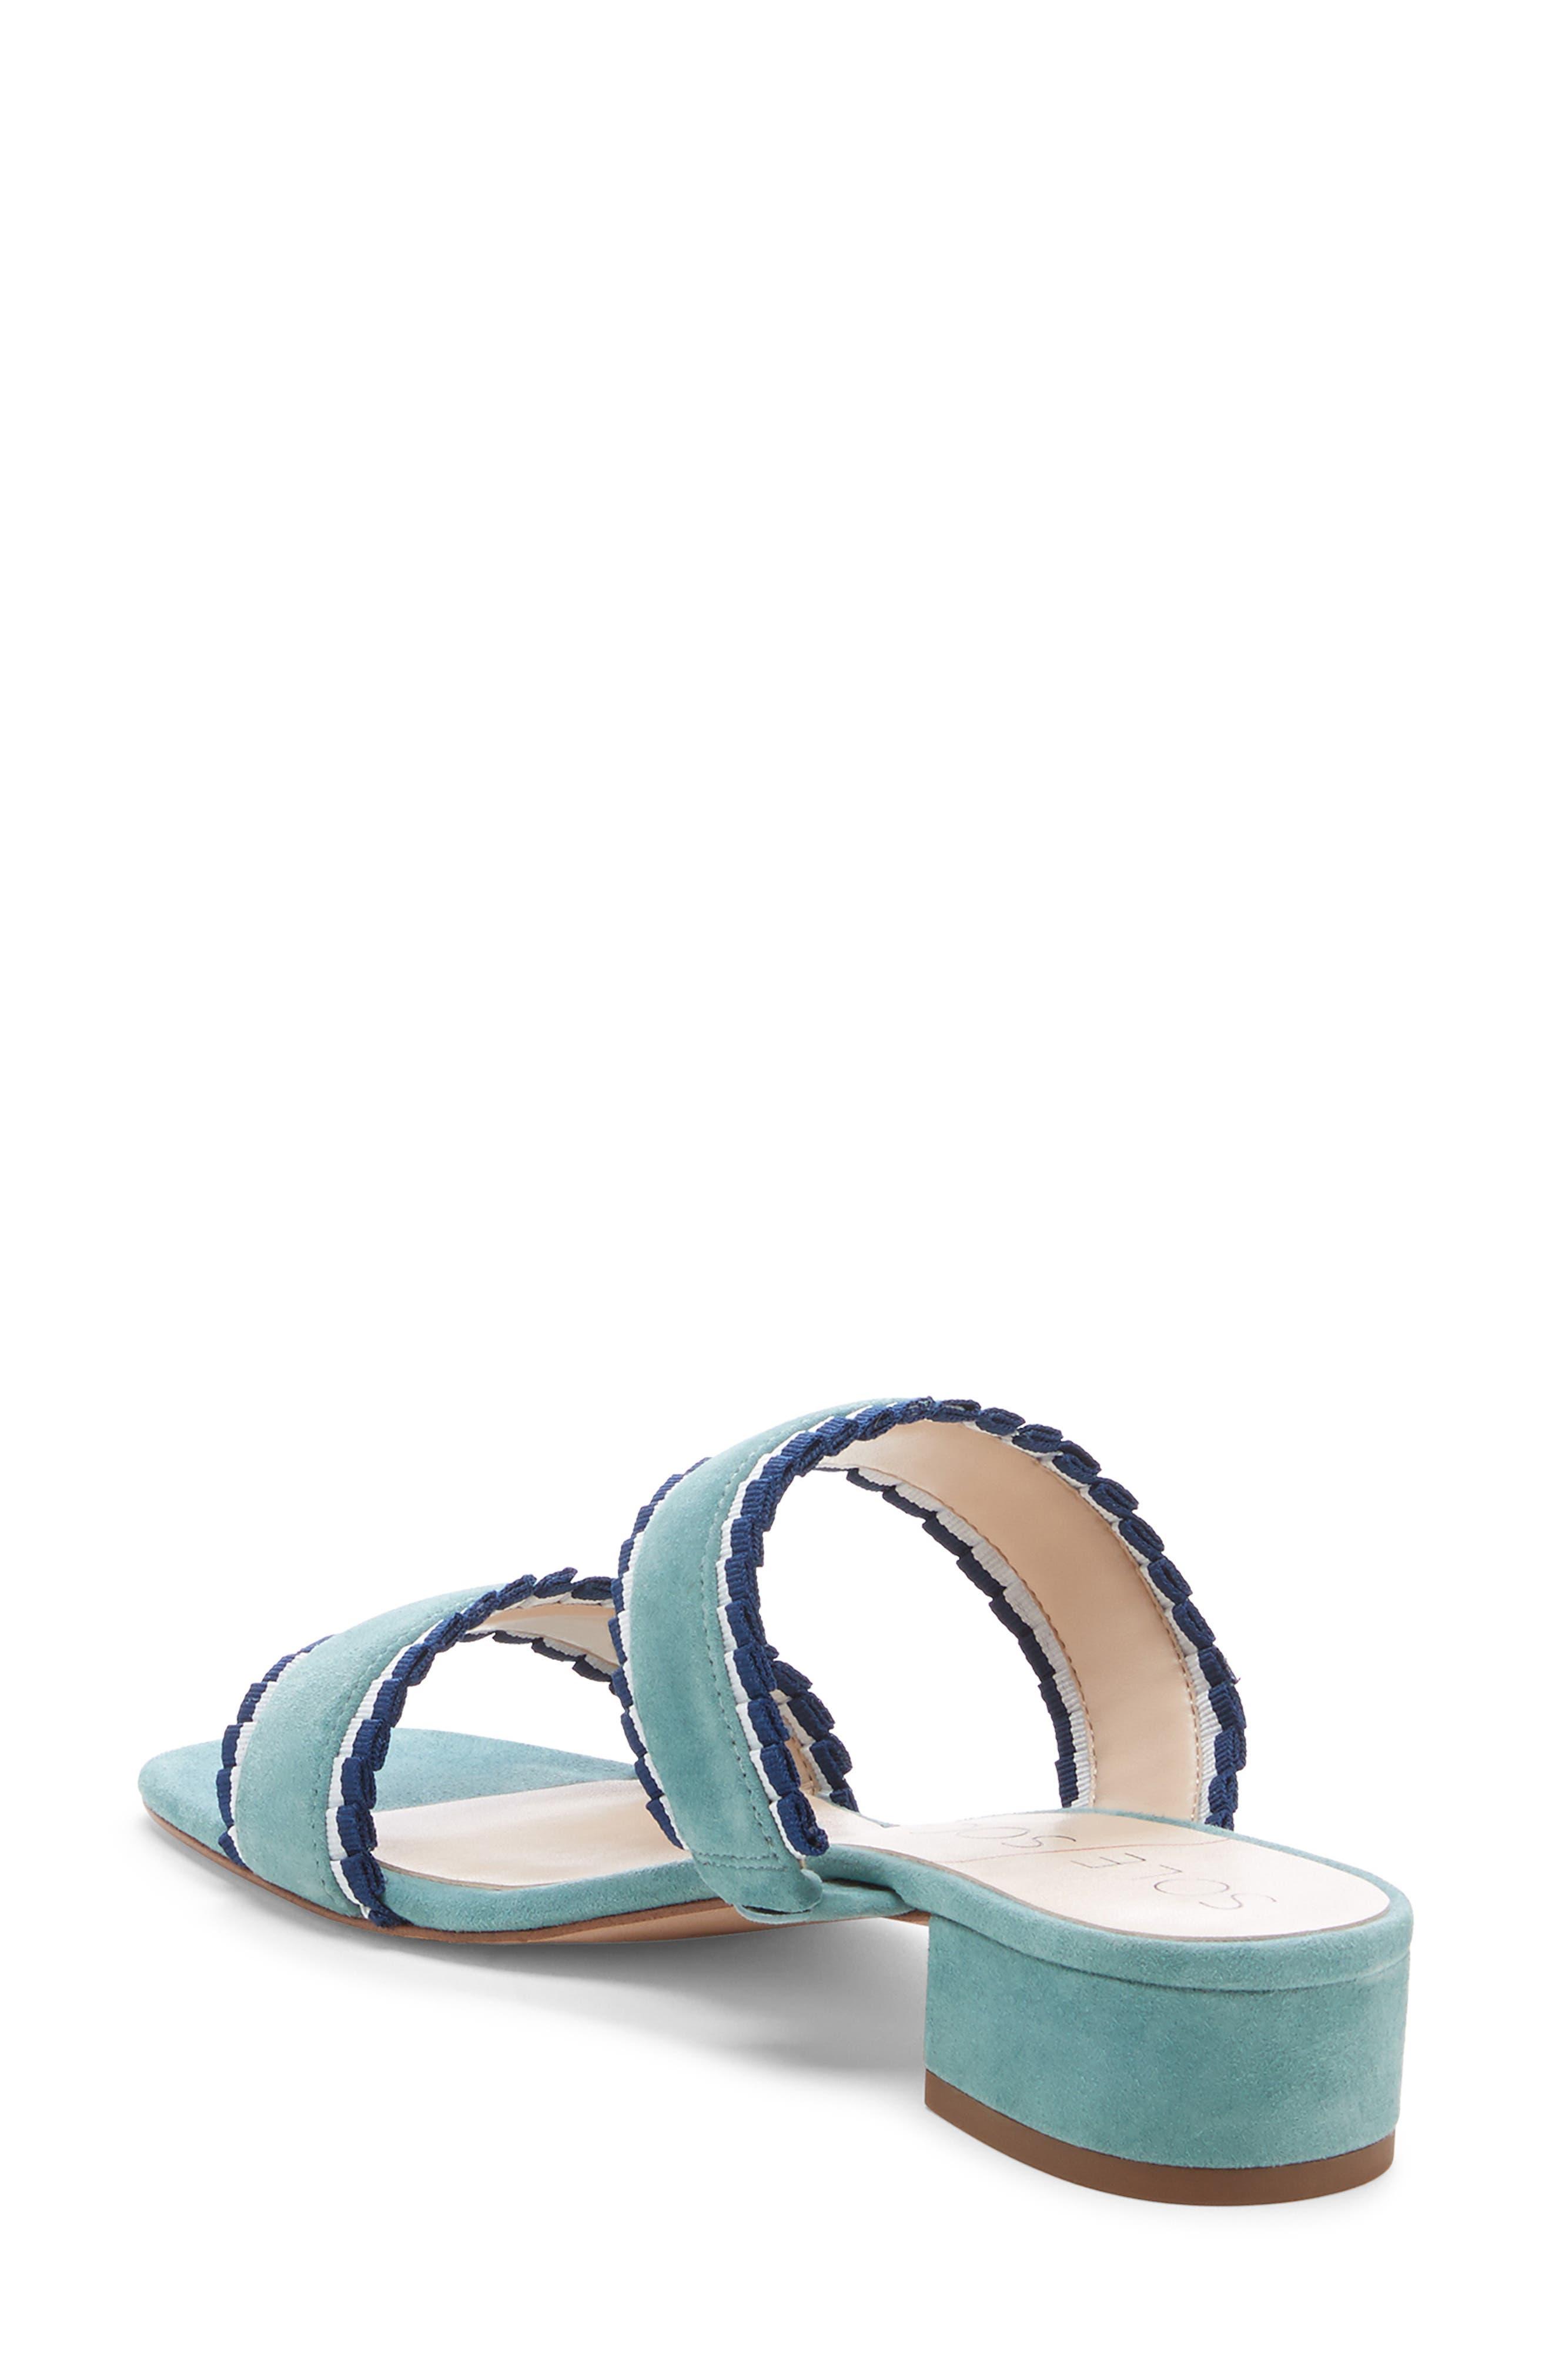 SOLE SOCIETY,                             Elura Slide Sandal,                             Alternate thumbnail 2, color,                             LIGHT SEA GREEN SUEDE